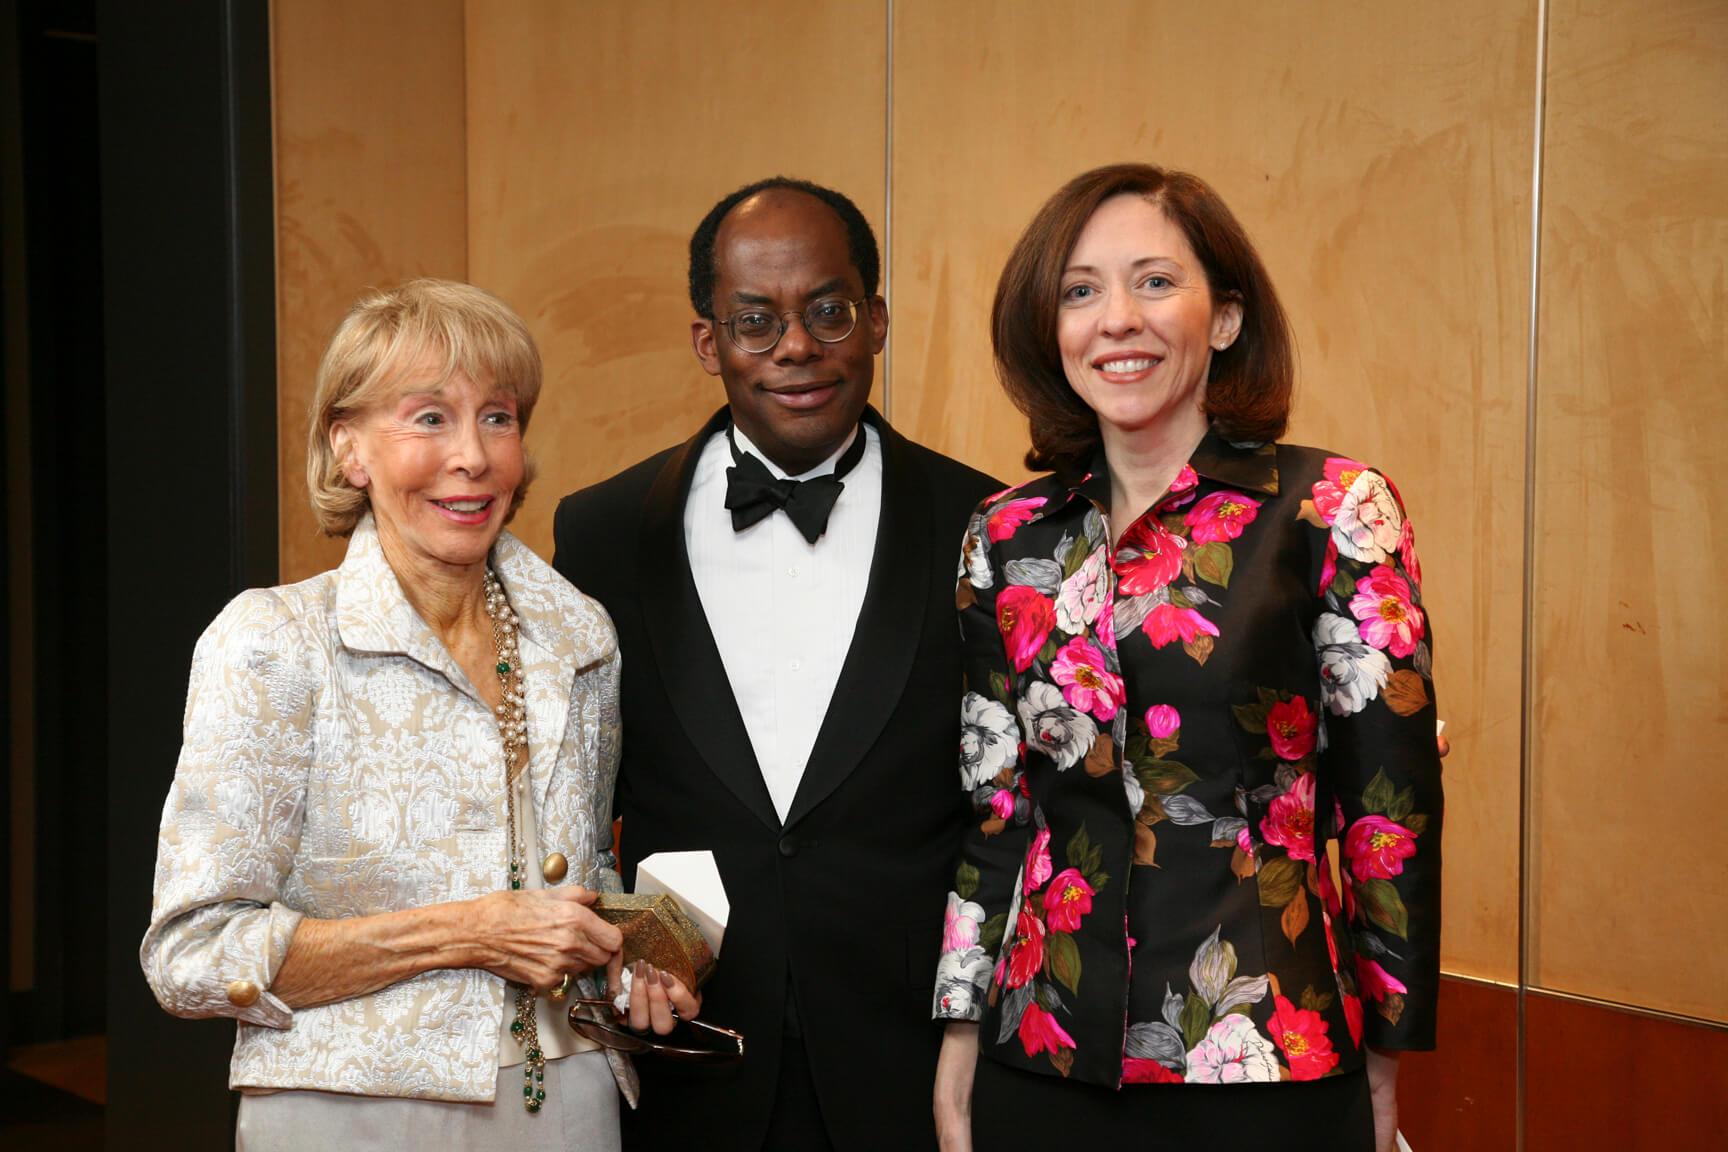 Mrs. Ina Ginsburg, Honorable Roger Ferguson, and Senator Maria Cantwell